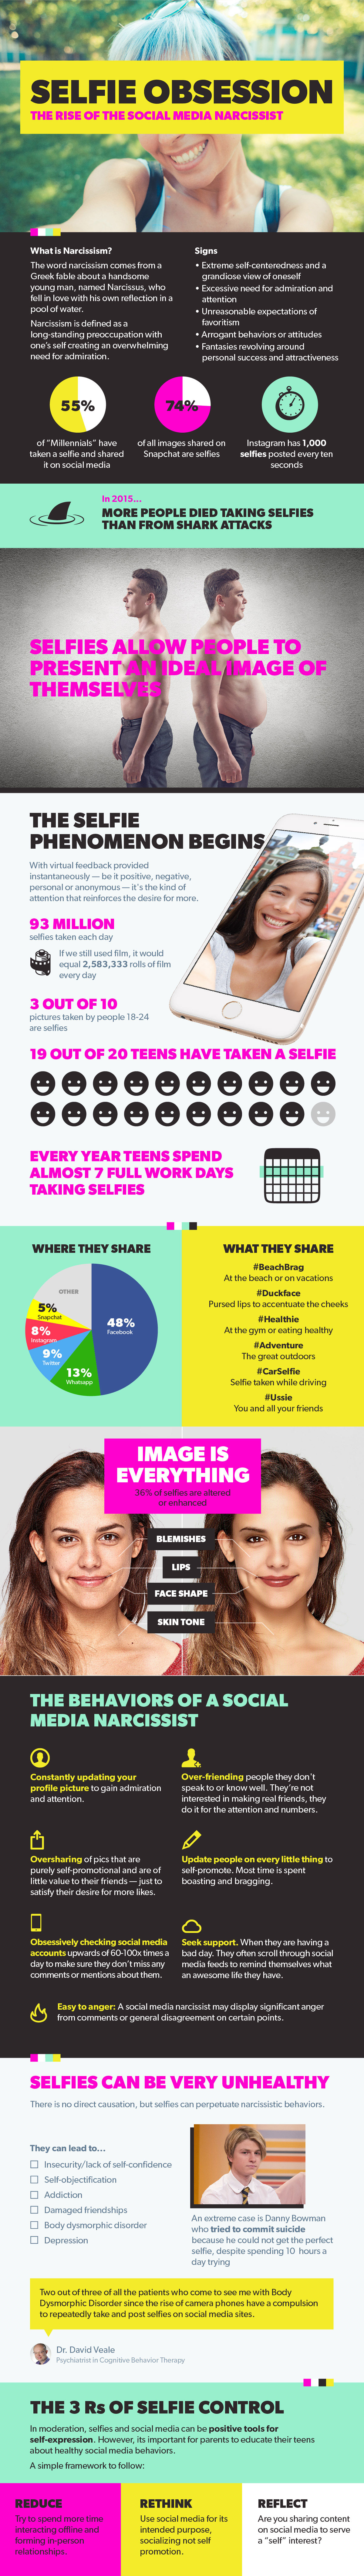 infographic_selfienarcissism